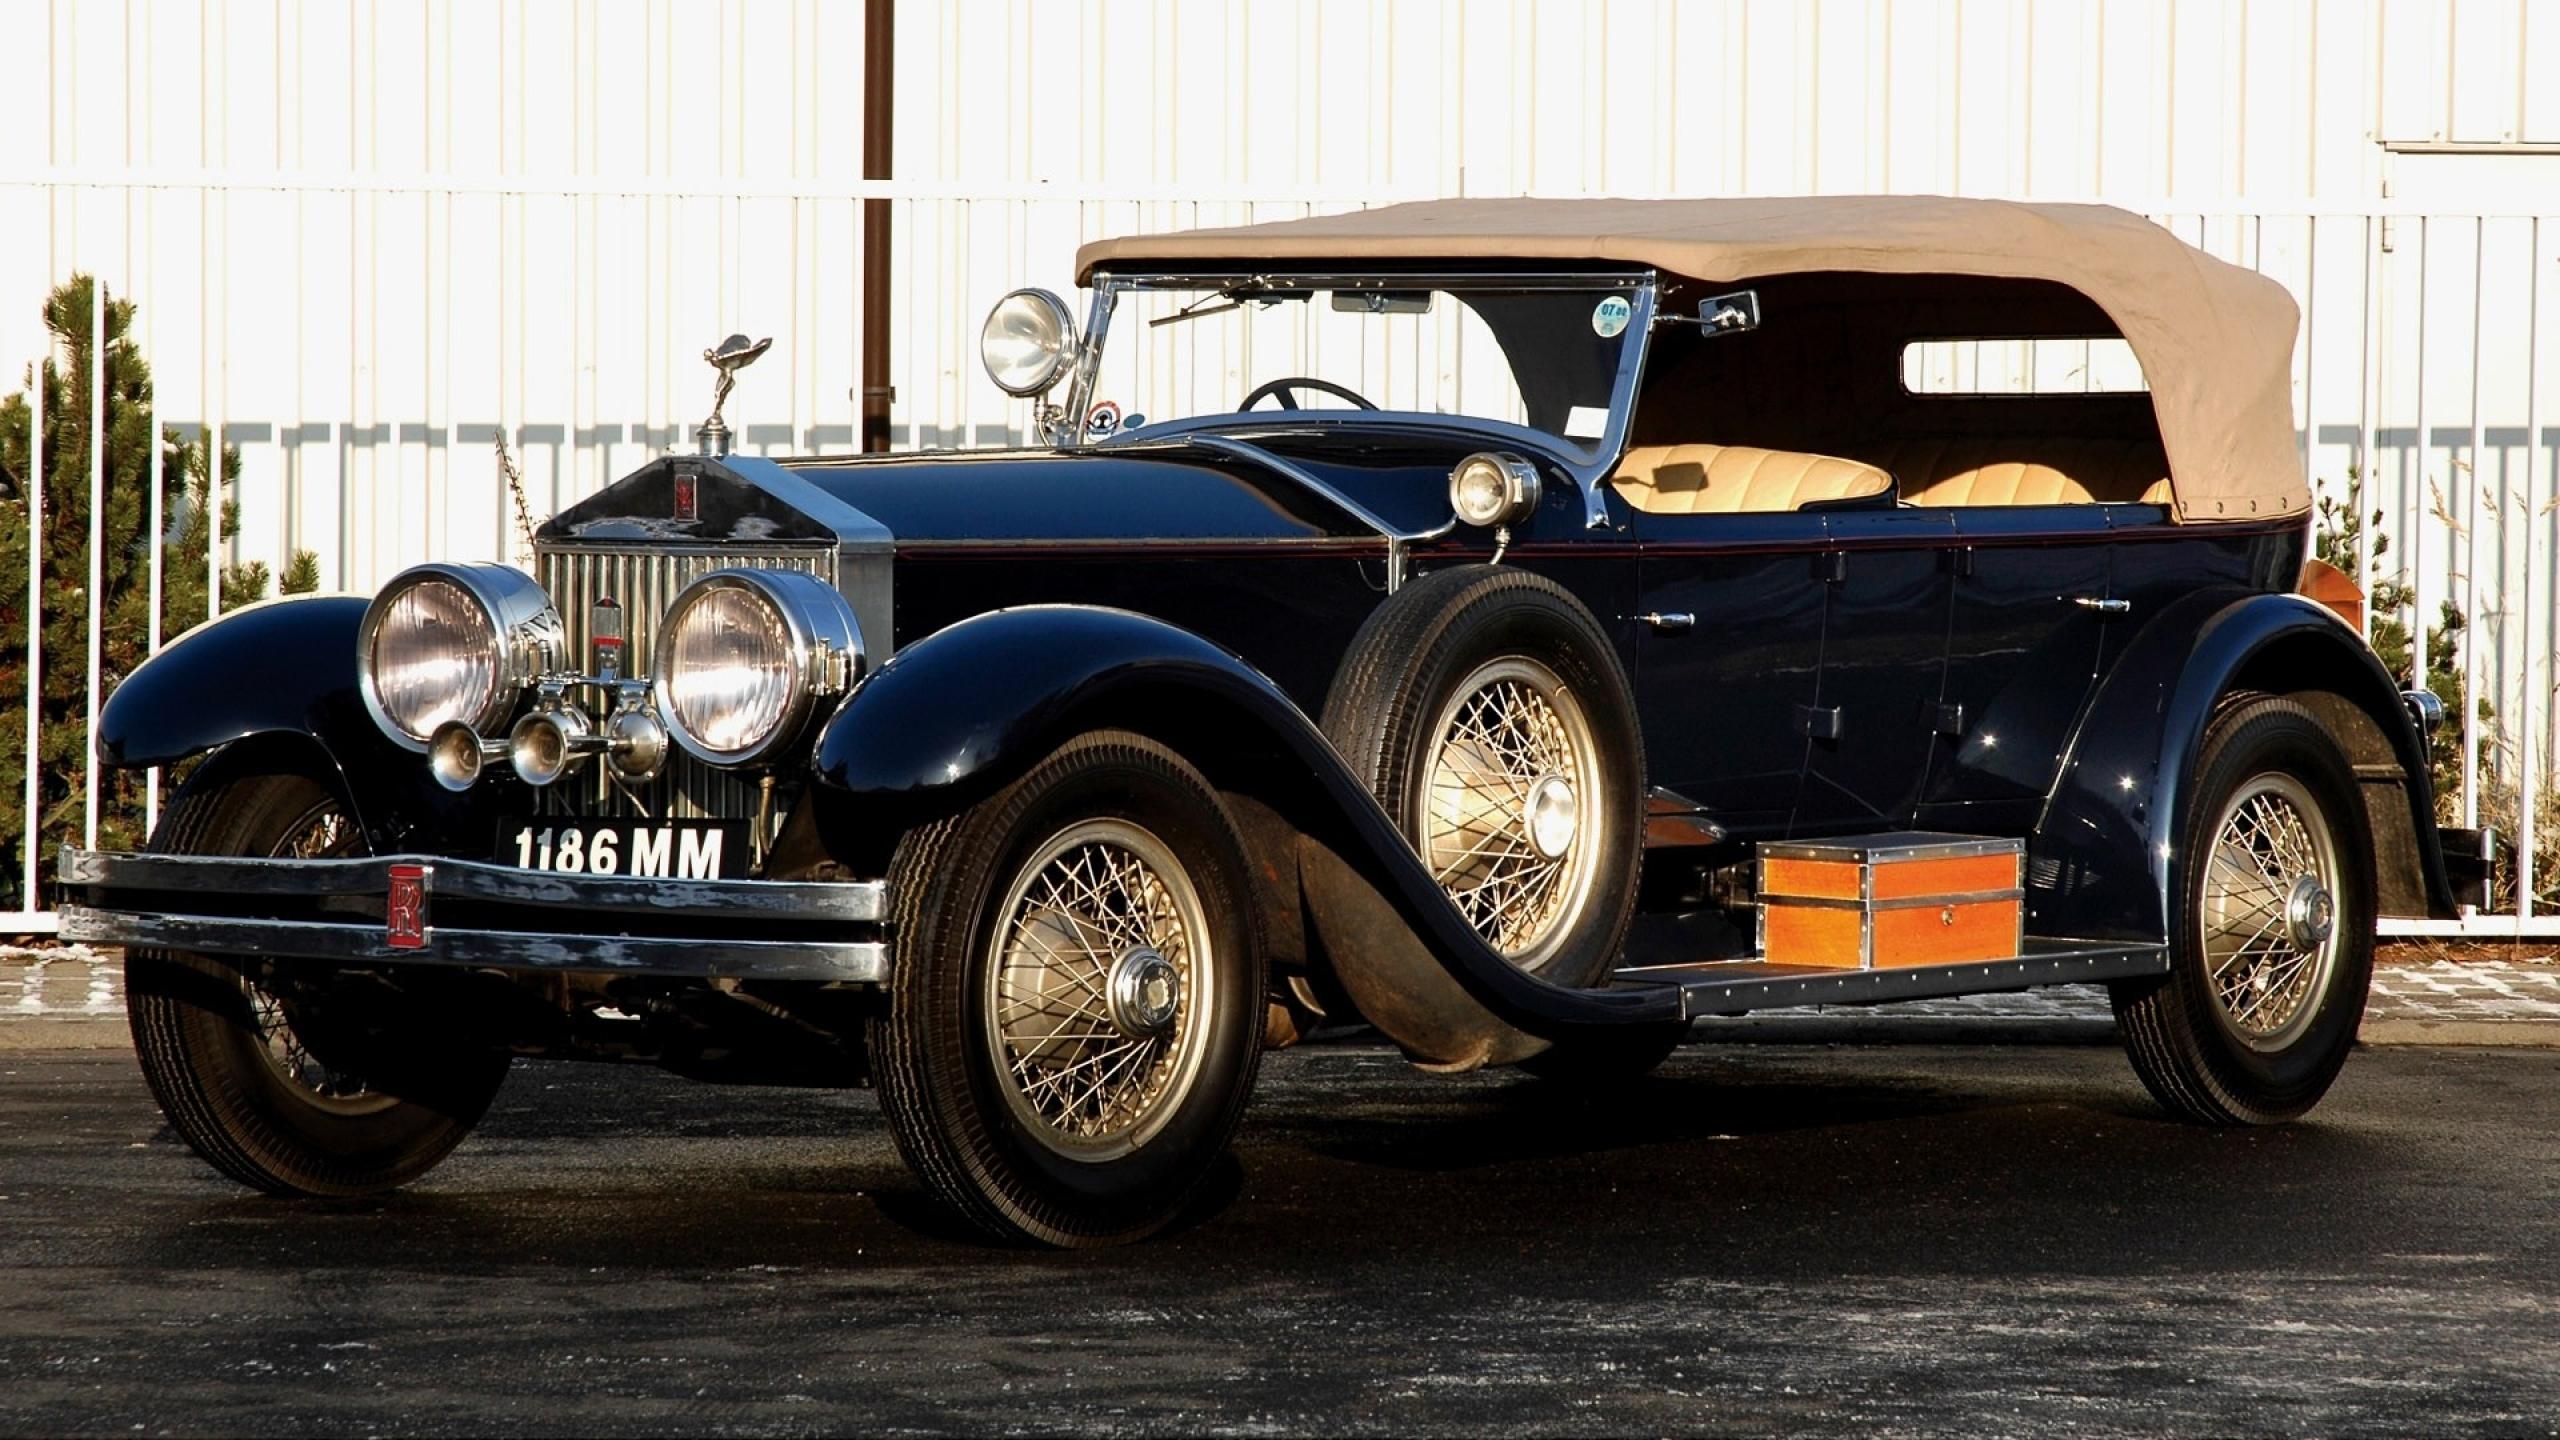 Gypsy Car Full Hd Wallpaper Rolls Royce Silver Ghost Full Hd Wallpaper And Background